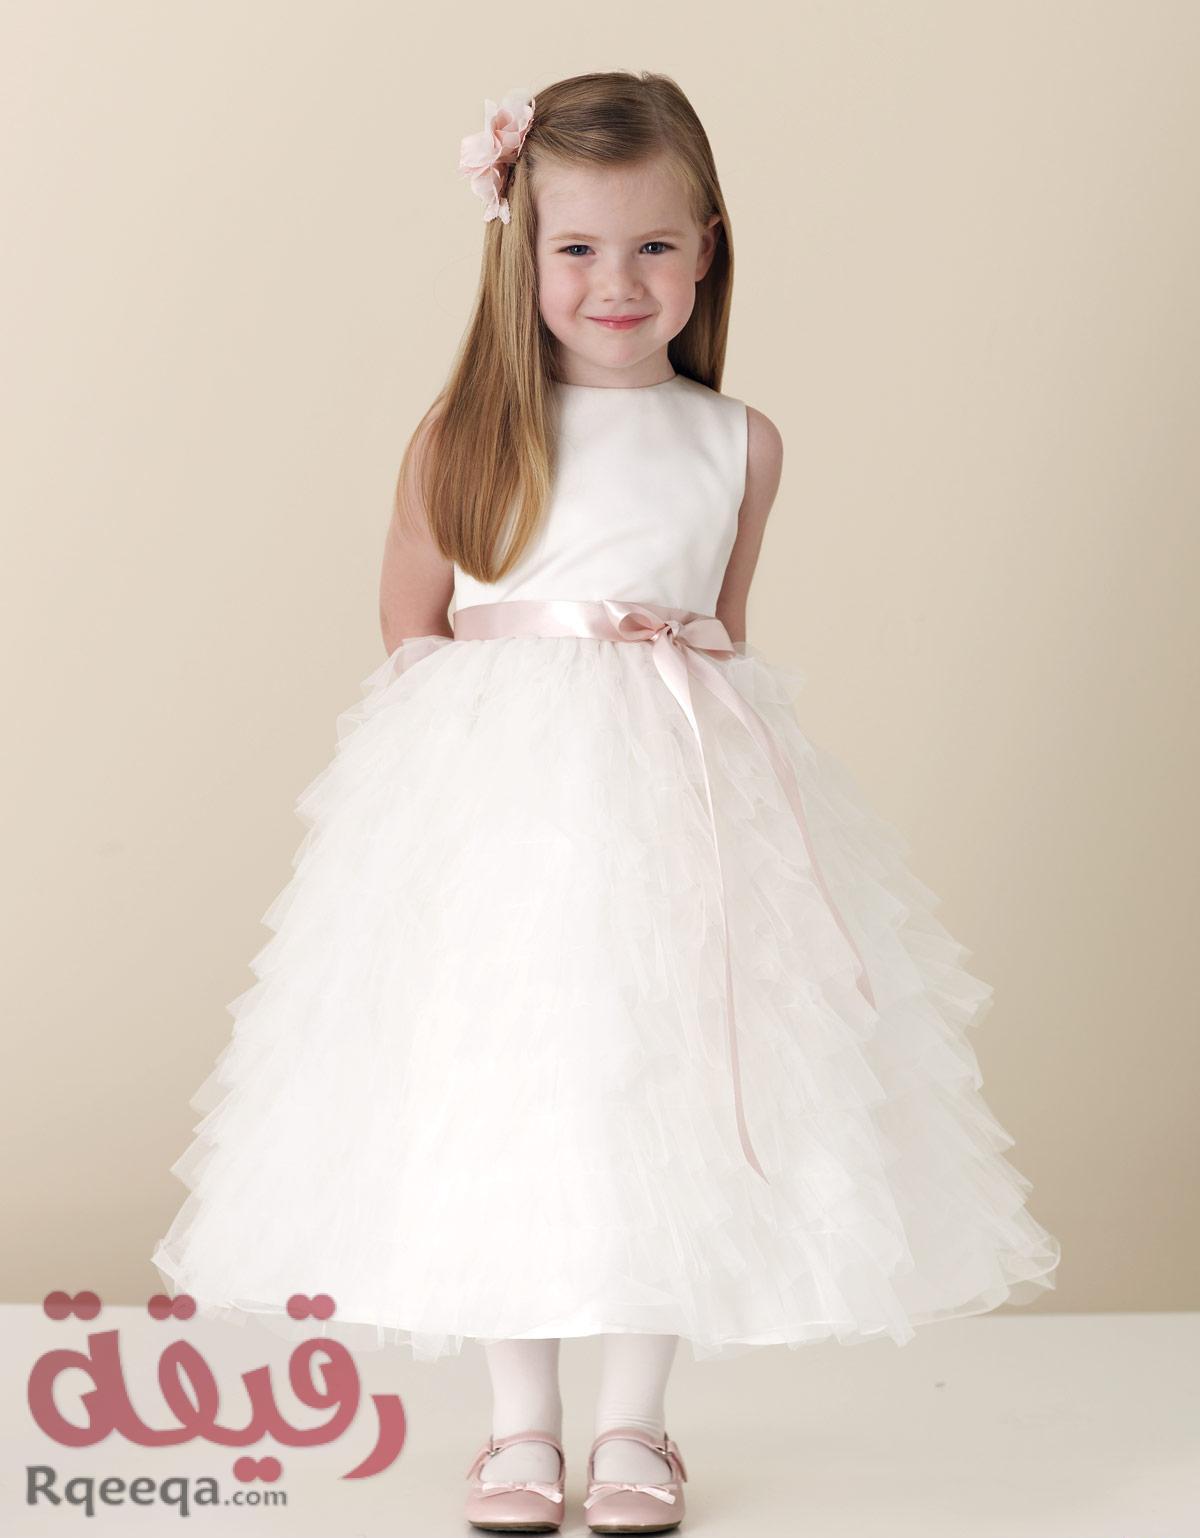 صورة صور ملابس اطفال بناتى , احلى و اجمل ملابس اطفال بناتي صور